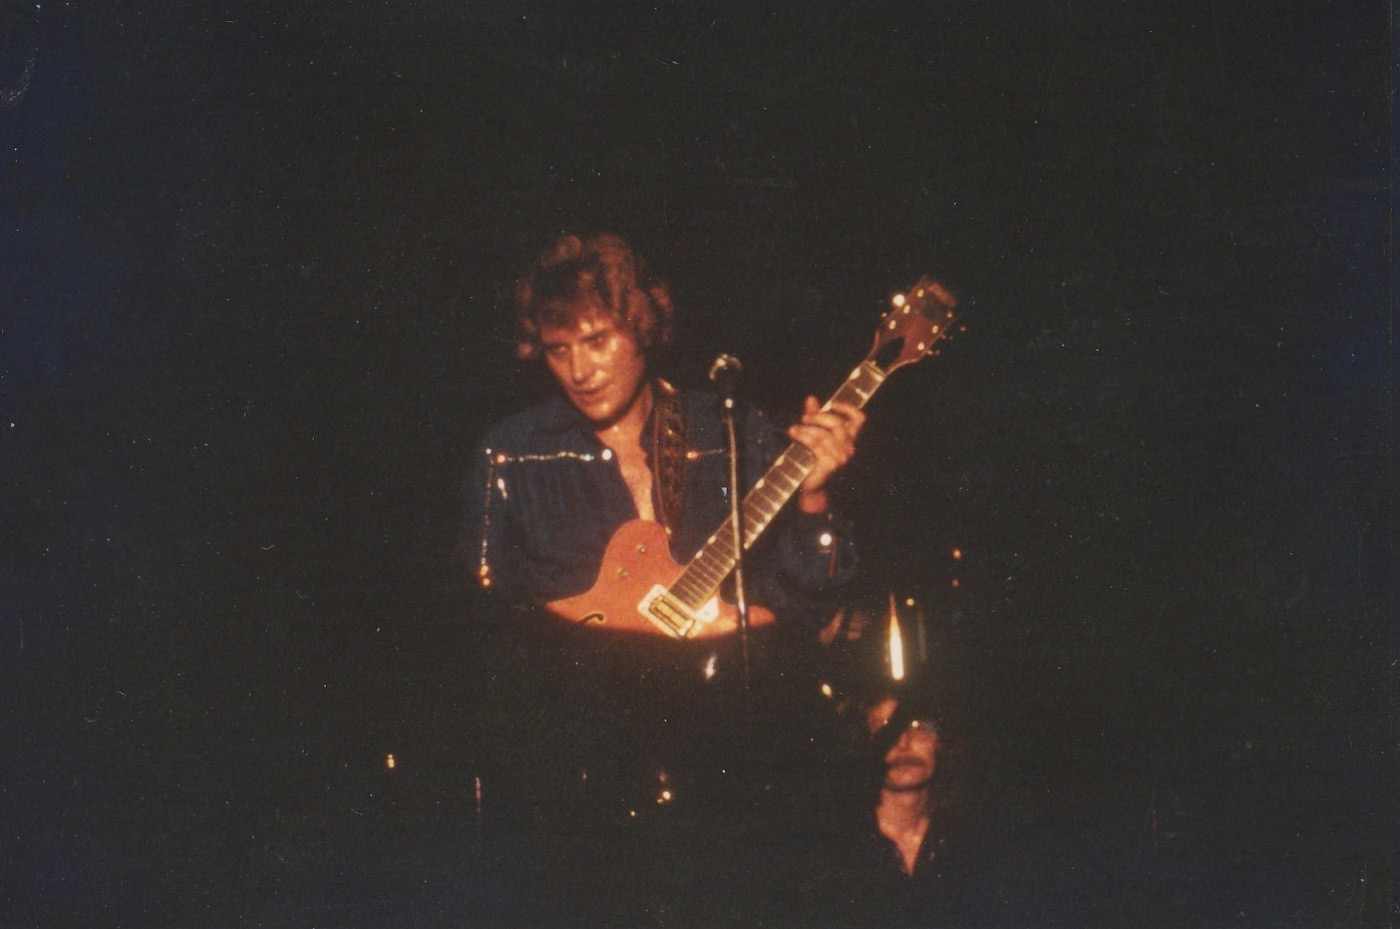 INÉDIT  :  JOHNNY HALLYDAY EN TOURNEE - HIVER 1978 -1979 ( PHOTOS INÉDITES )   Img_2642